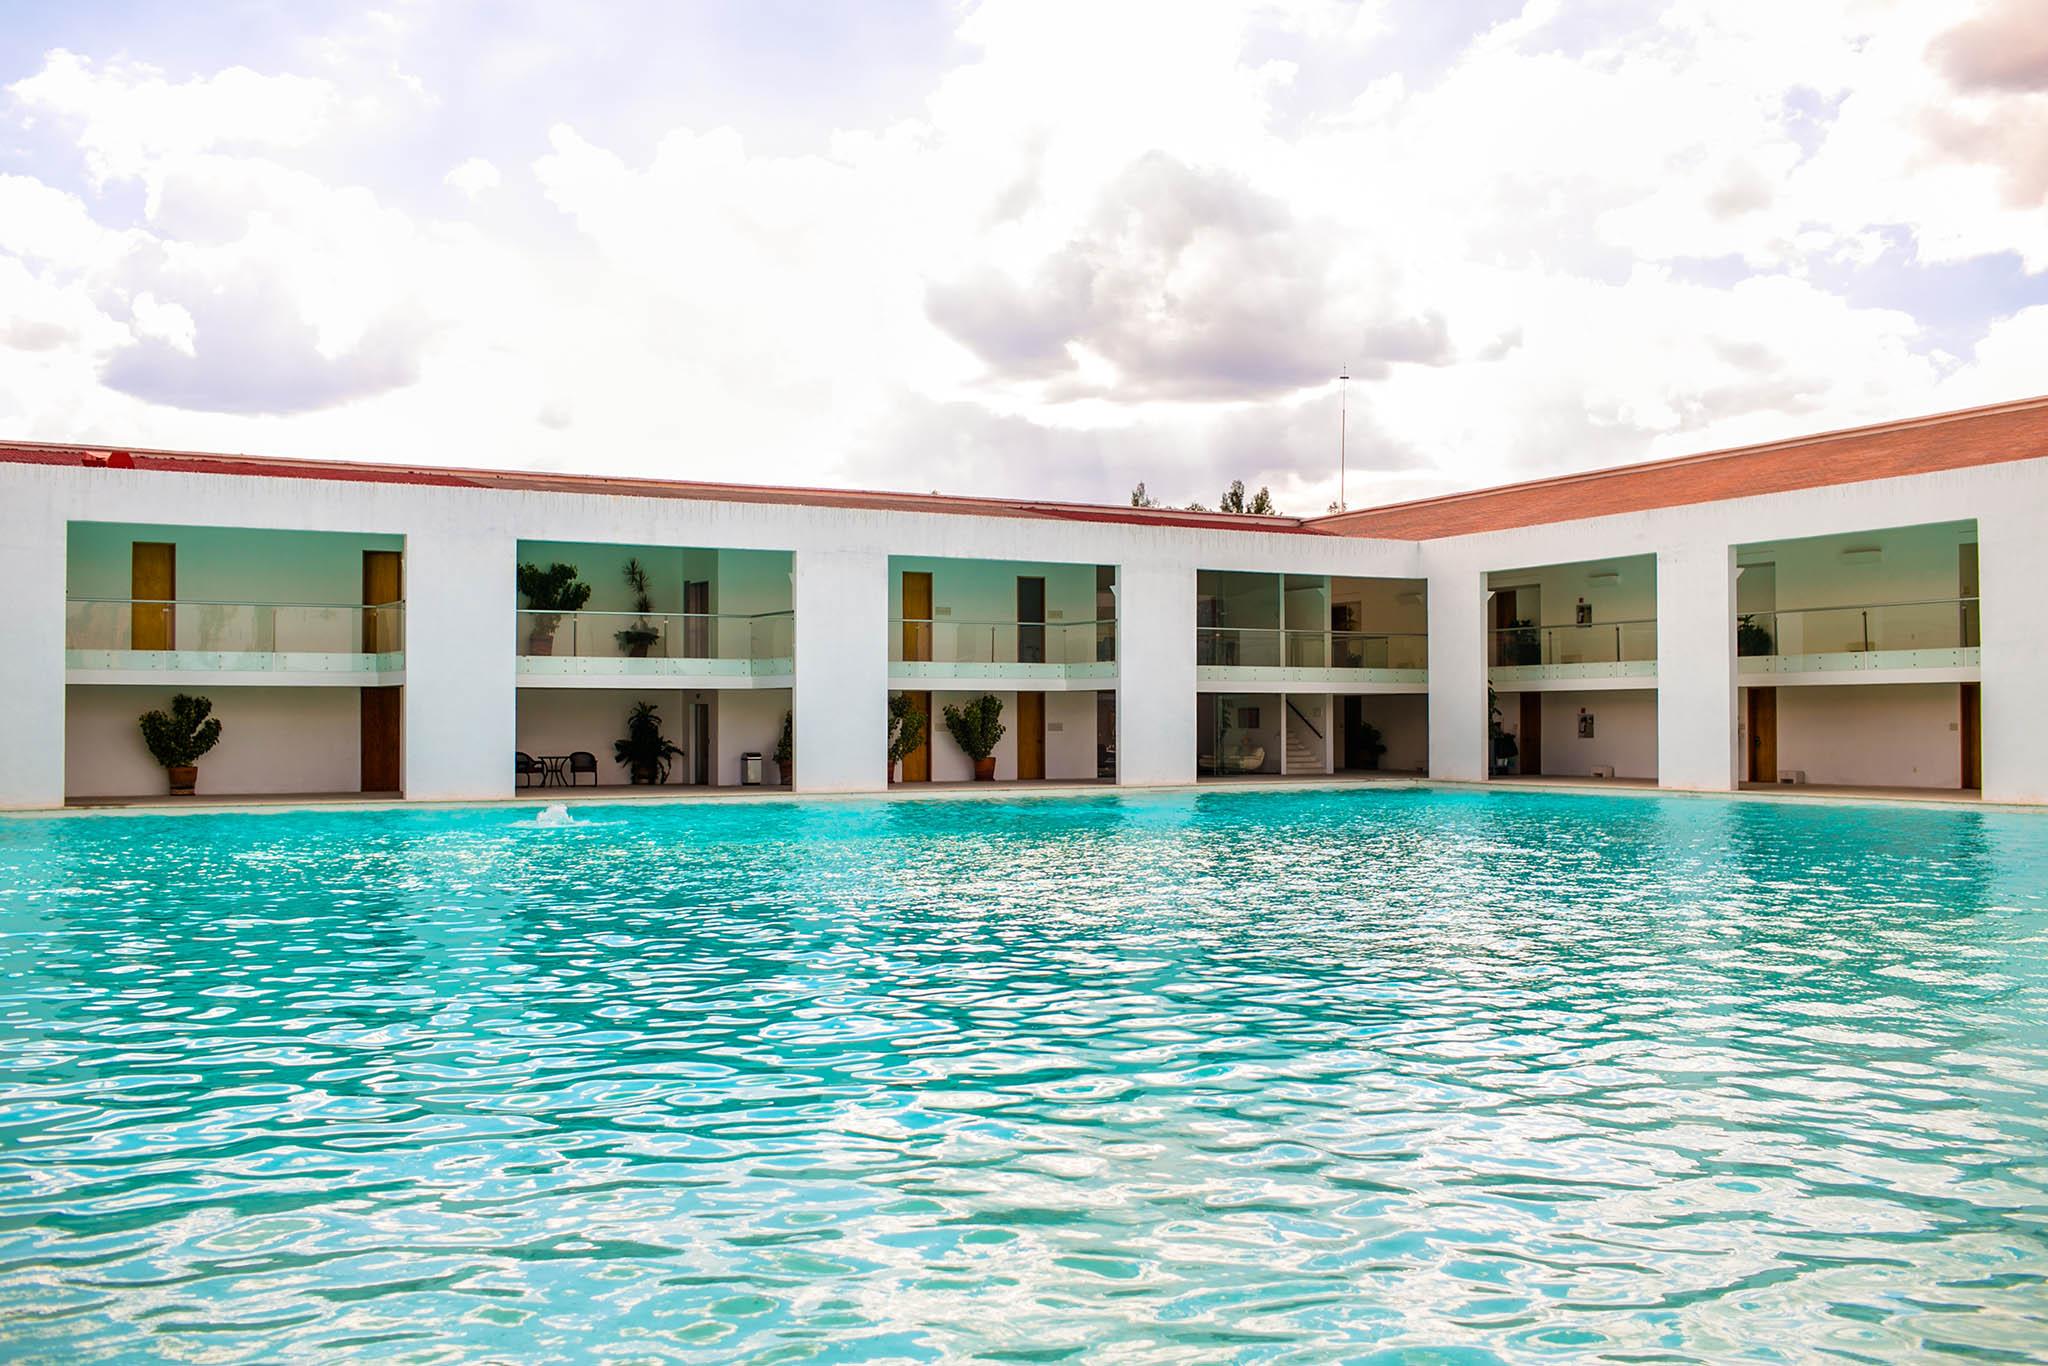 Hacienda-cantalagua-bodas1